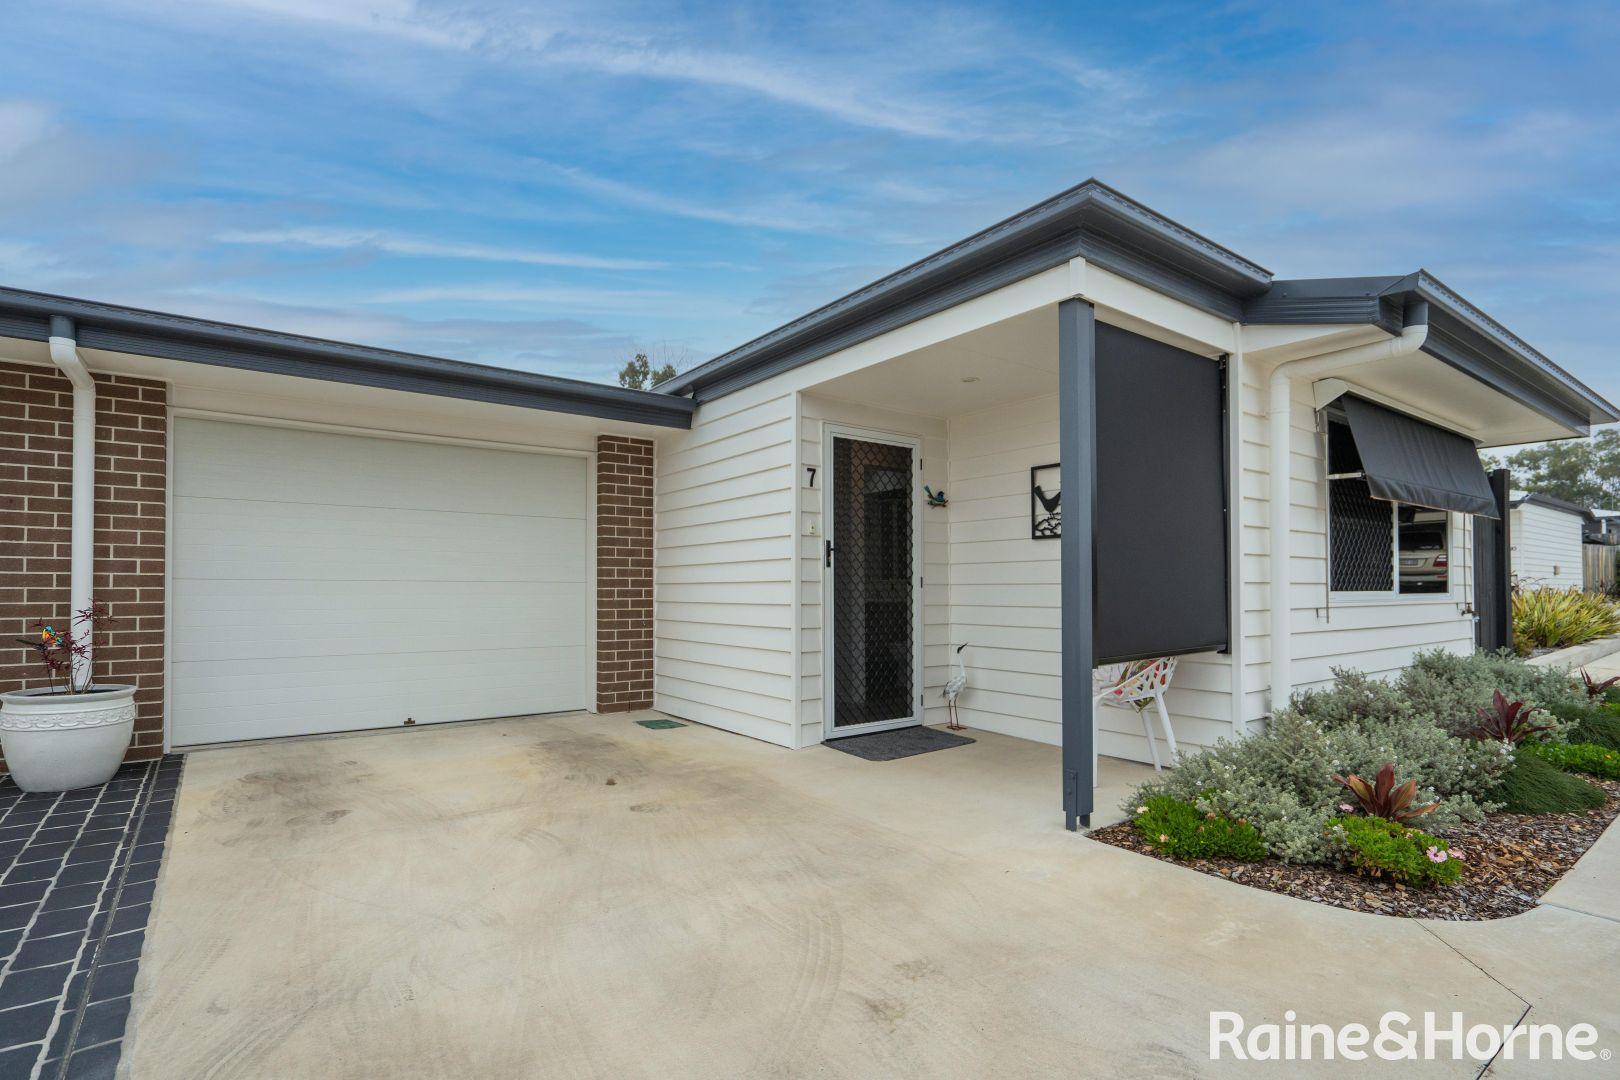 7/235 Torquay Terrace, Torquay QLD 4655, Image 1